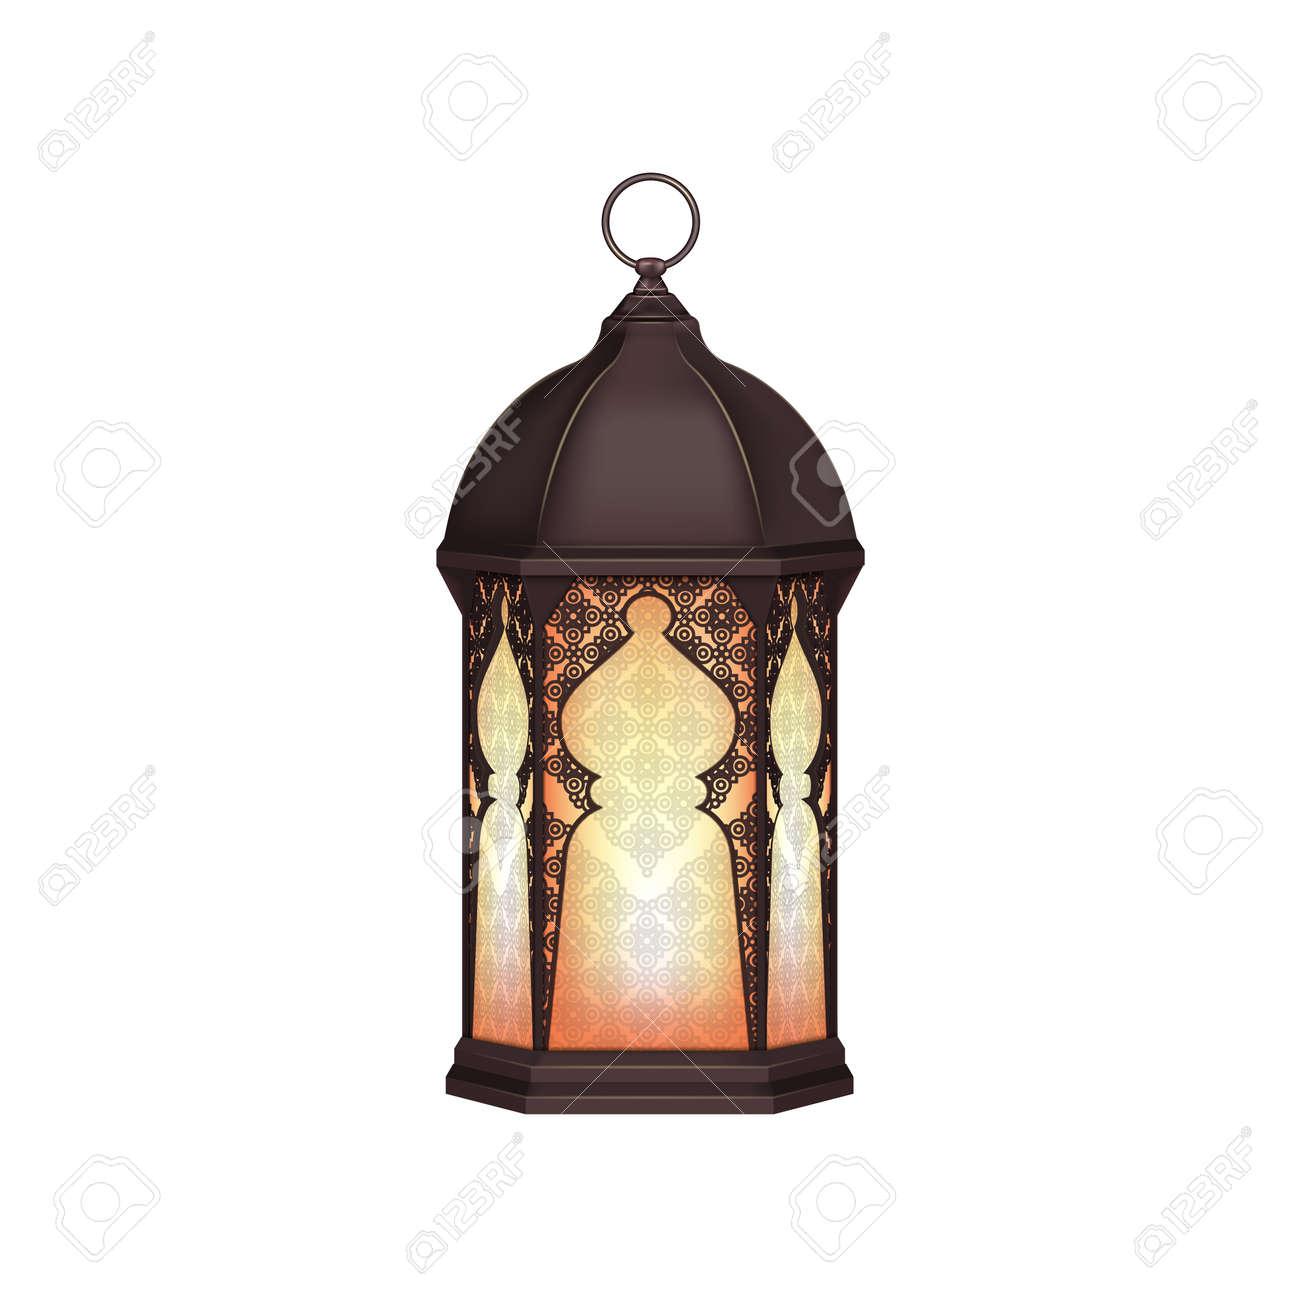 Ramadan Lantern Illustration - 171721582